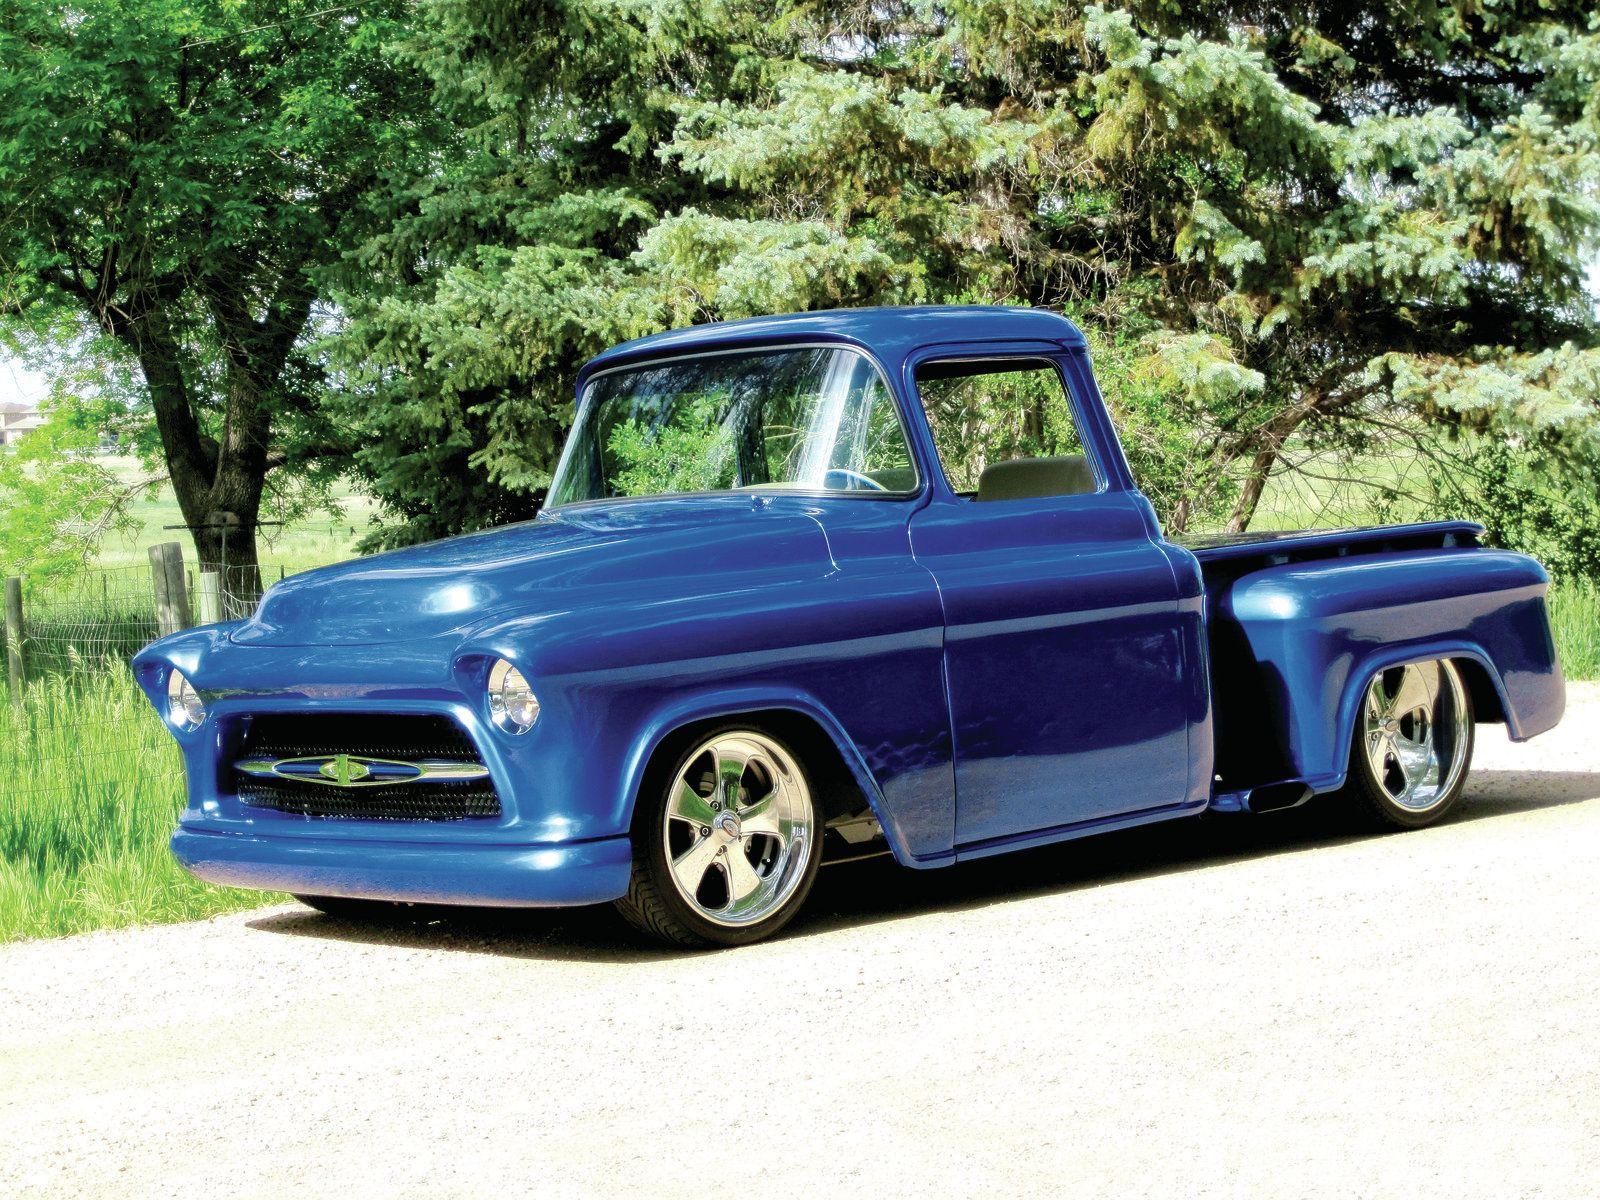 1955 chevy truck | 1955 Chevrolet Truck Side | 55 - 59 Chevrolet ...